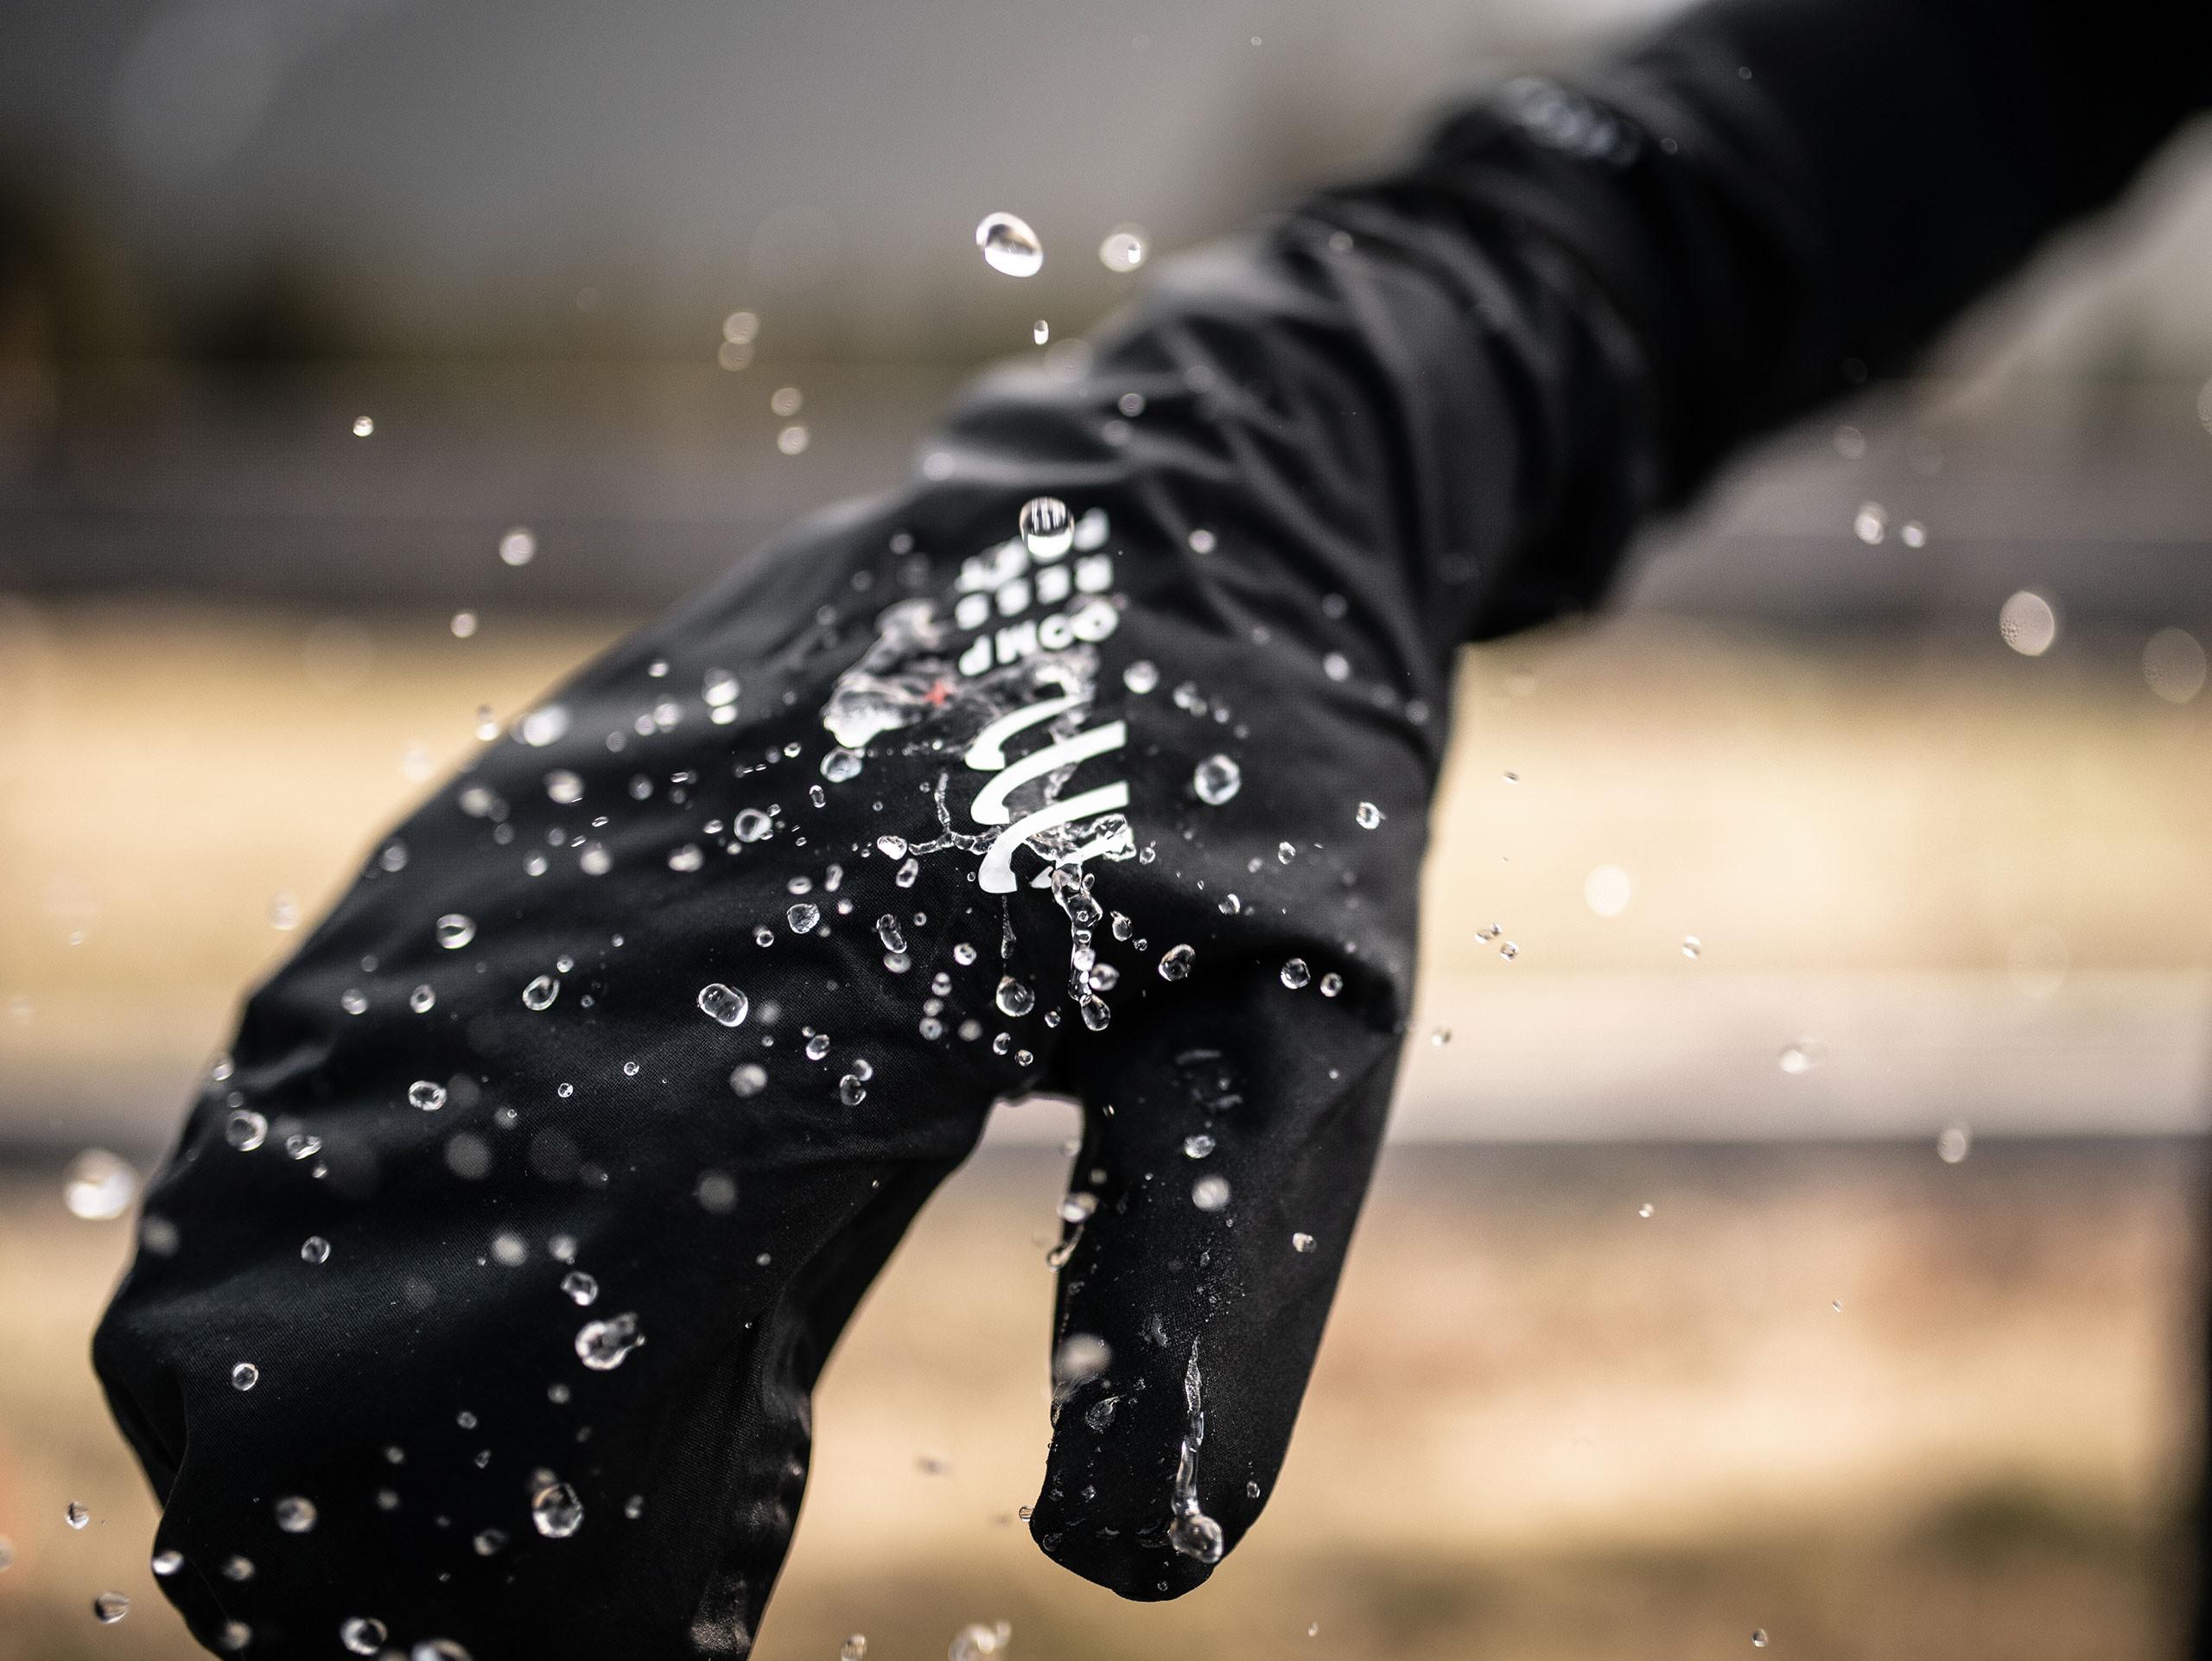 Hurricane Waterproof 10/10 Mittens black